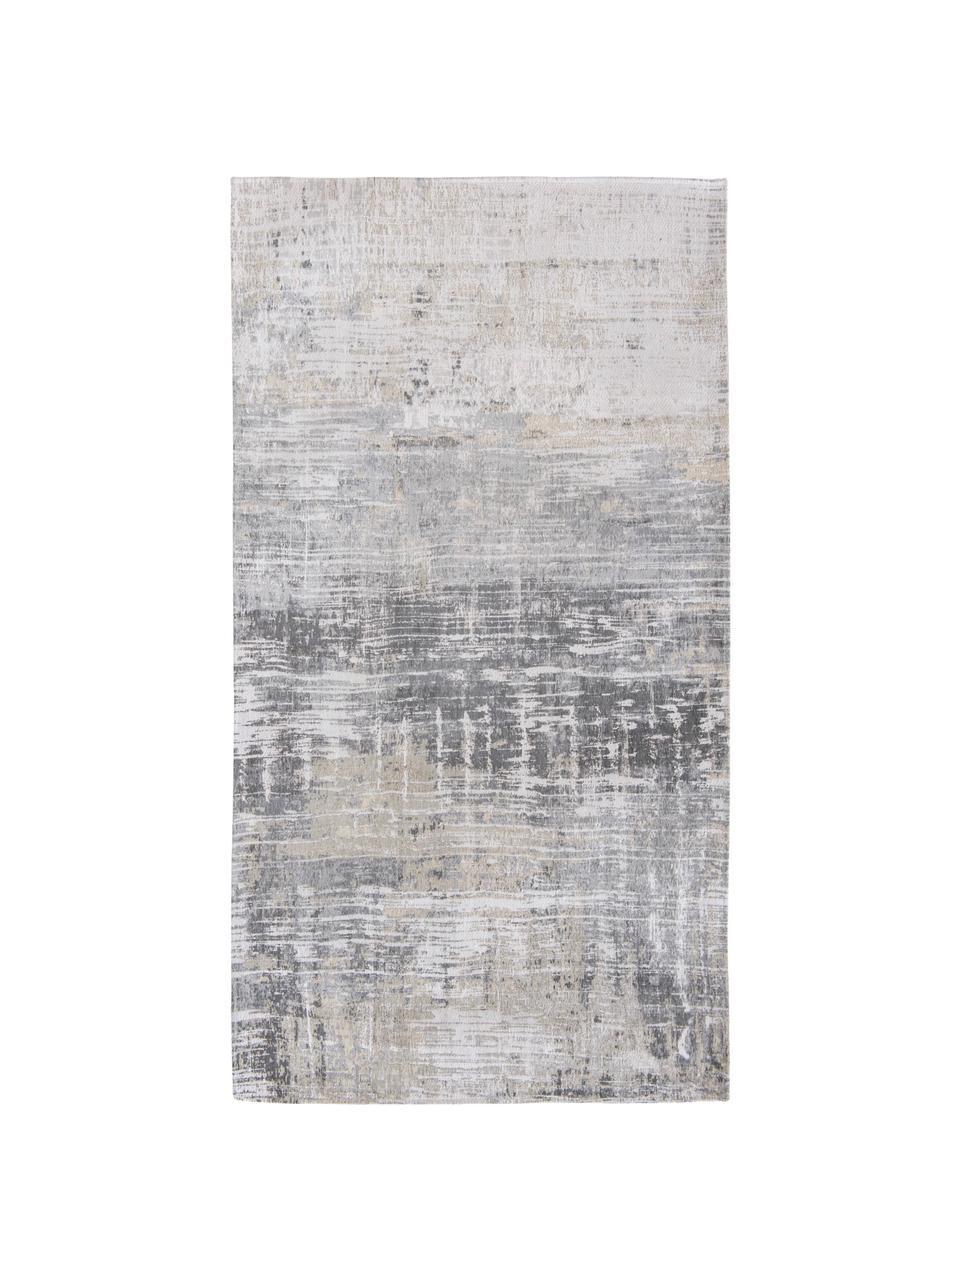 Designteppich Streaks in Grau, Flor: 85%Baumwolle, 15%hochgl, Webart: Jacquard, Grautöne, B 140 x L 200 cm (Größe S)